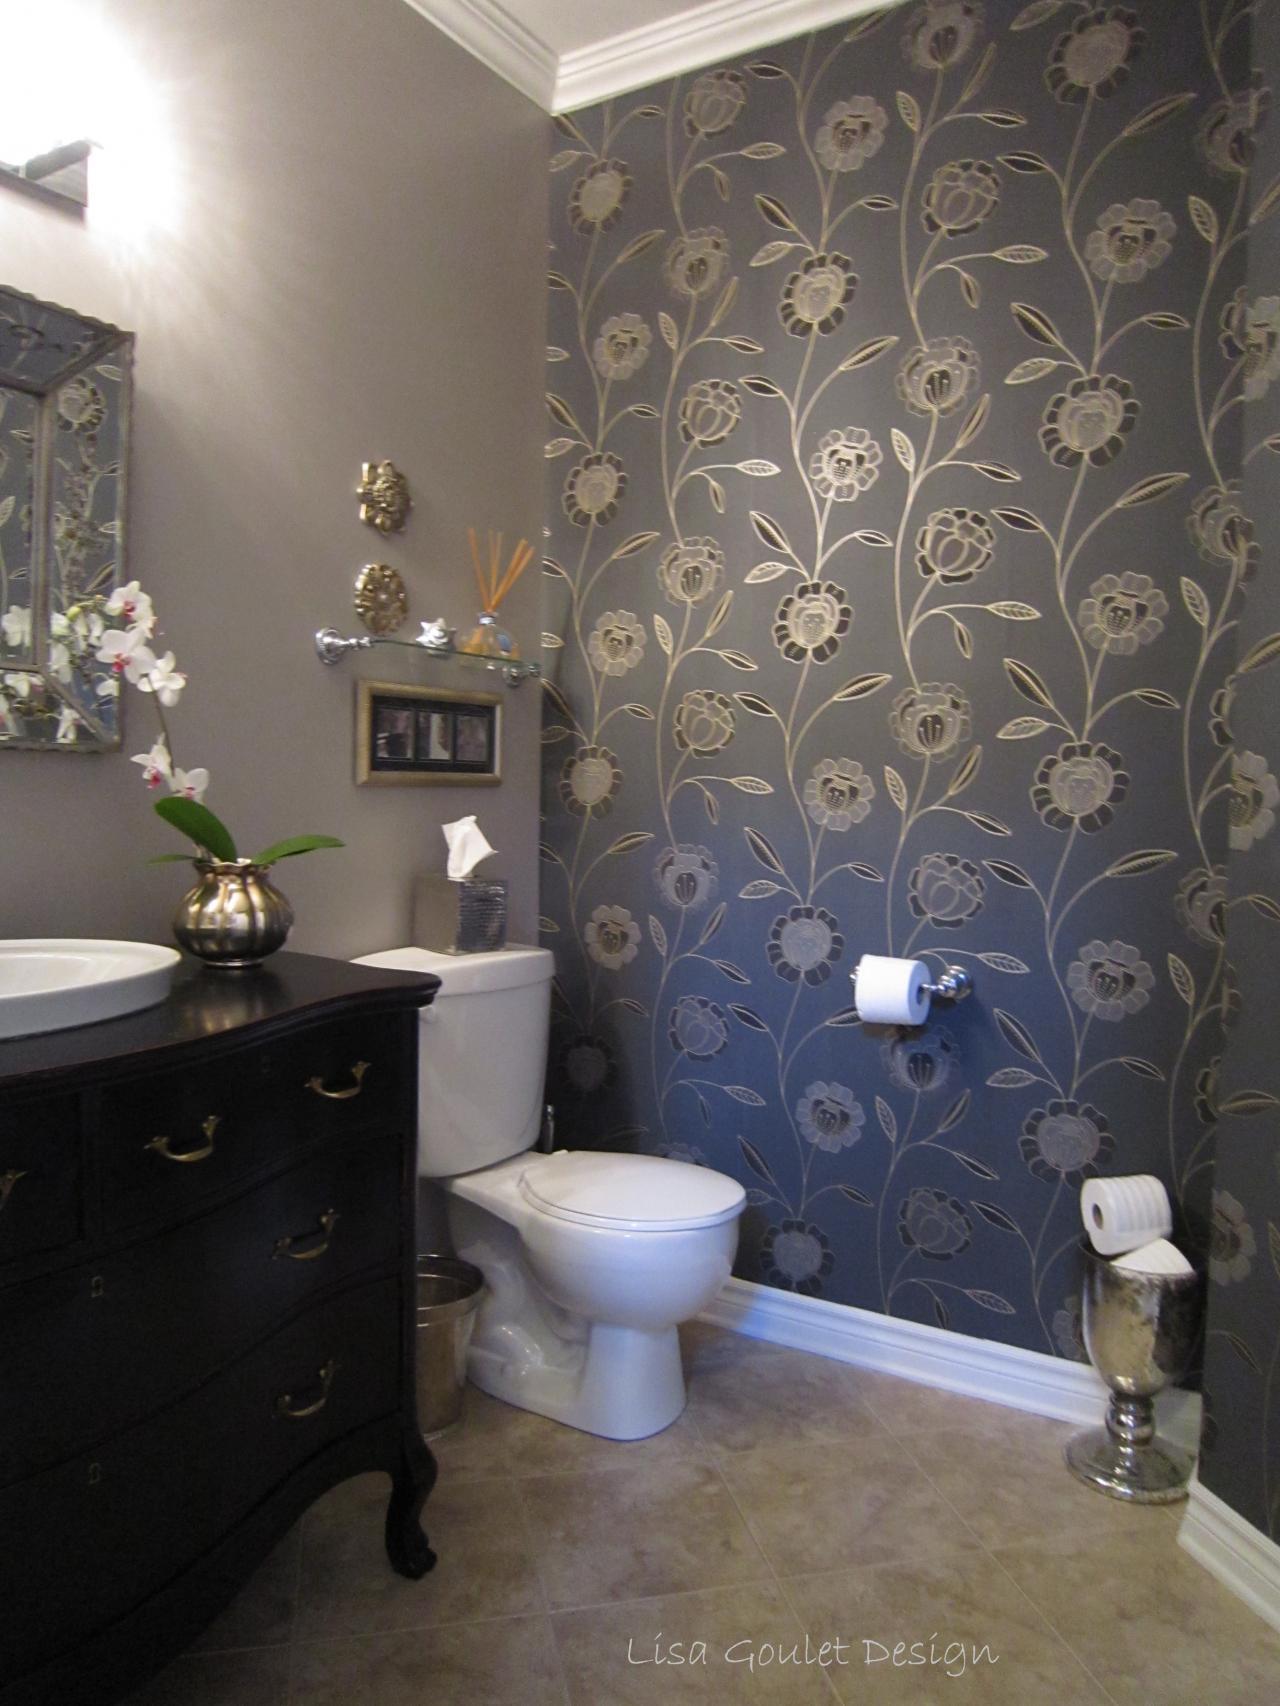 [48+] Bathroom Wallpaper for Small Rooms on WallpaperSafari